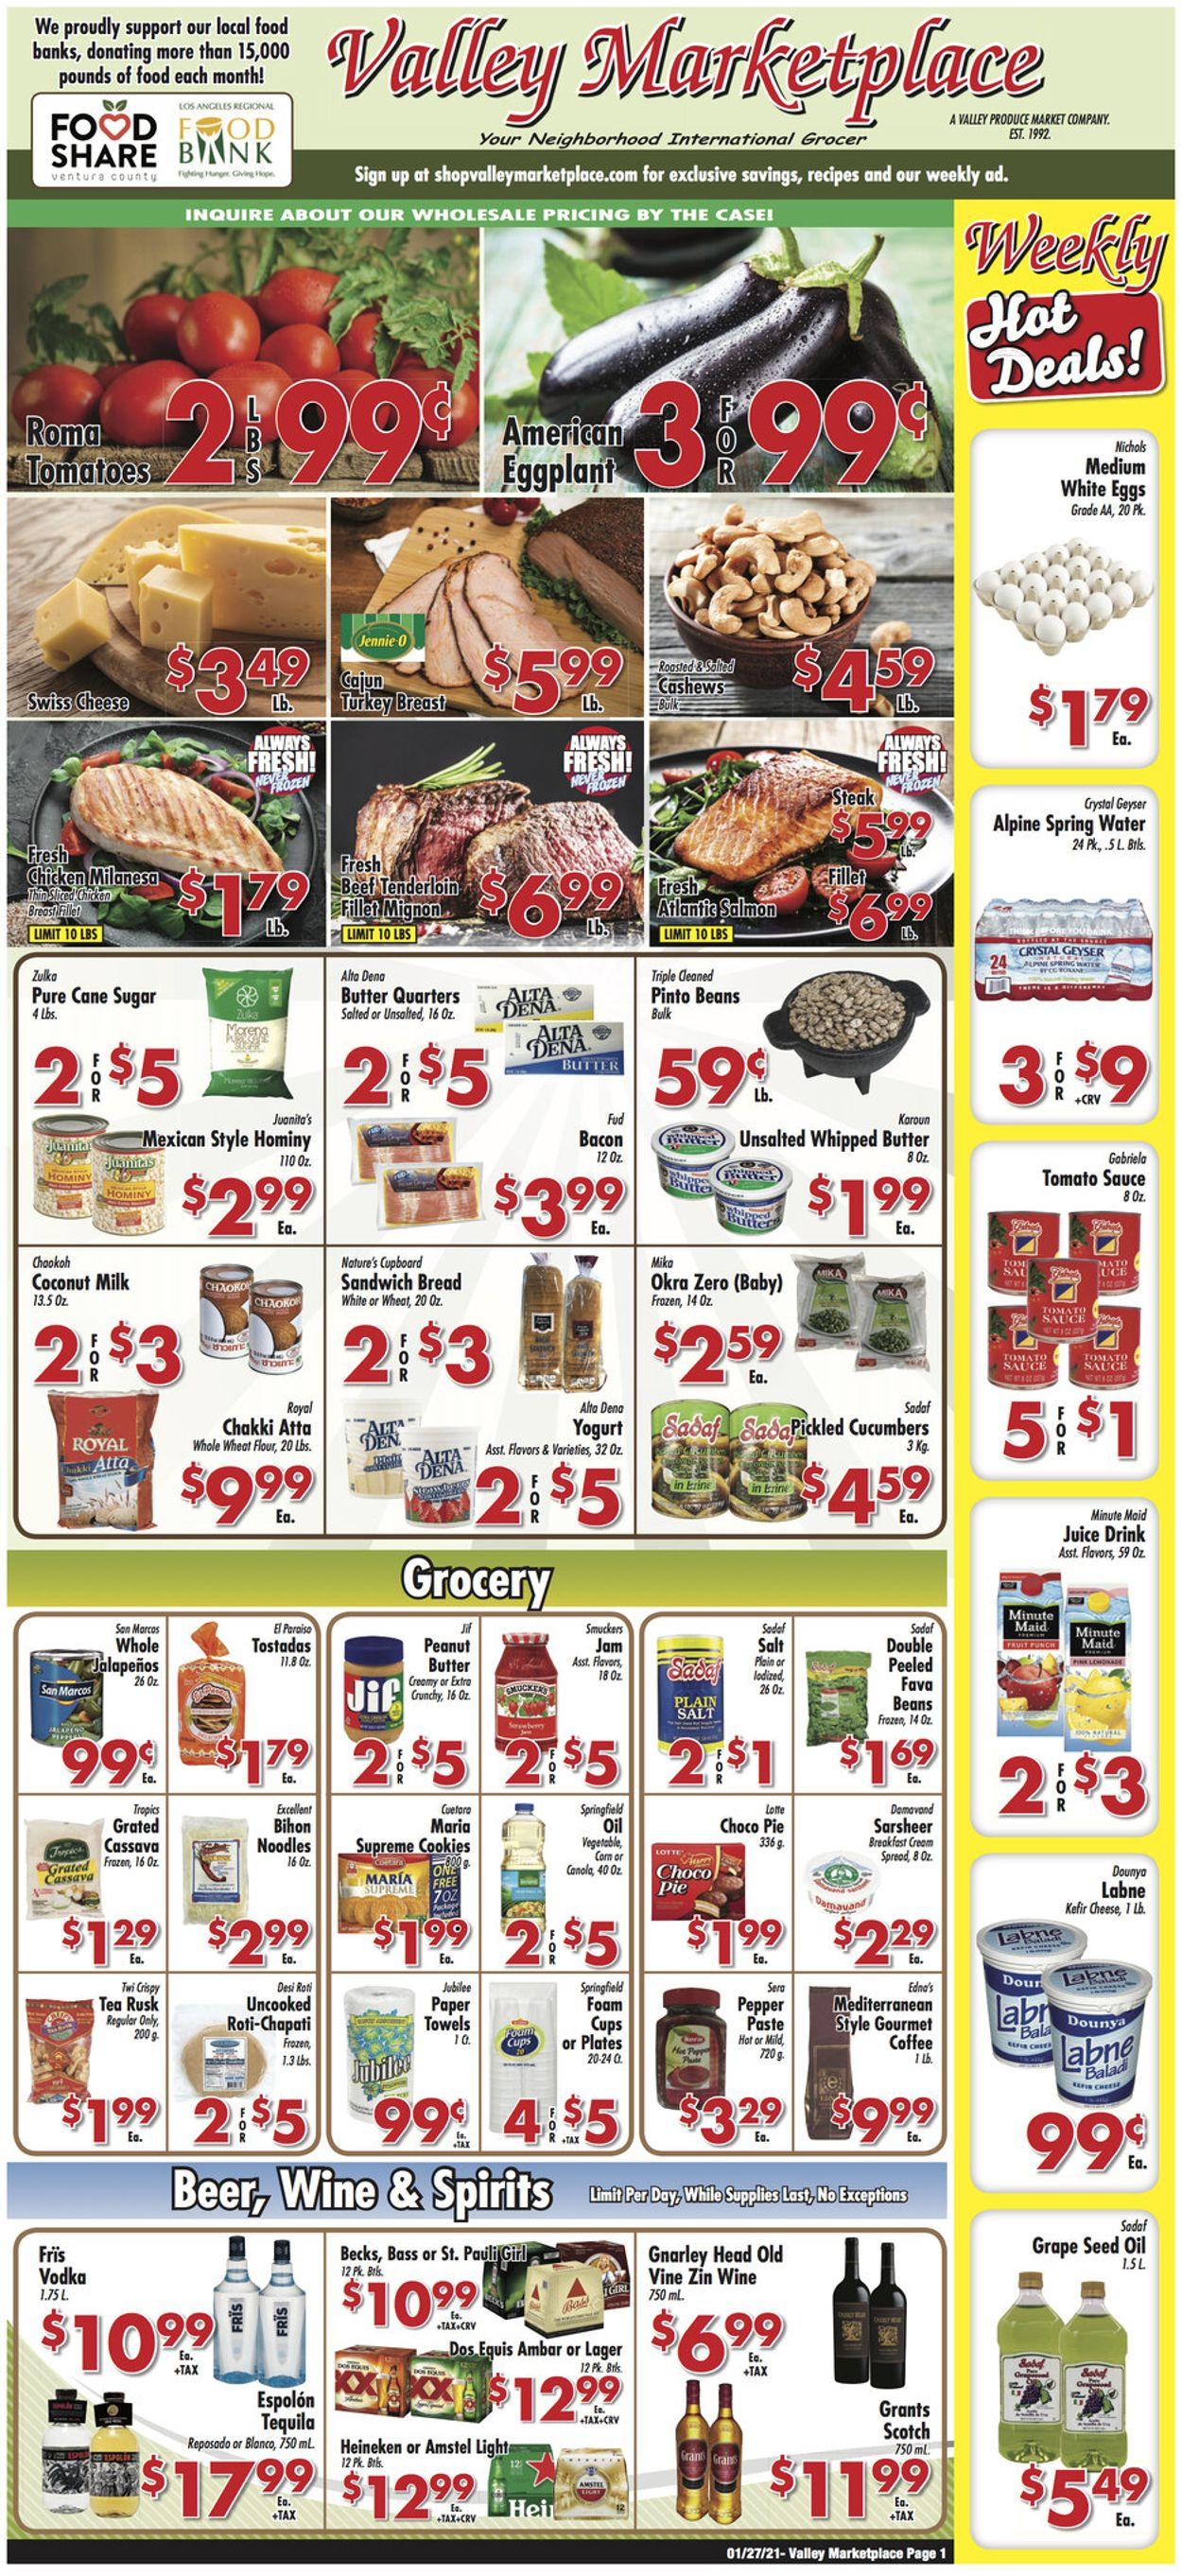 Valley Marketplace Weekly Ad Circular - valid 01/27-02/02/2021